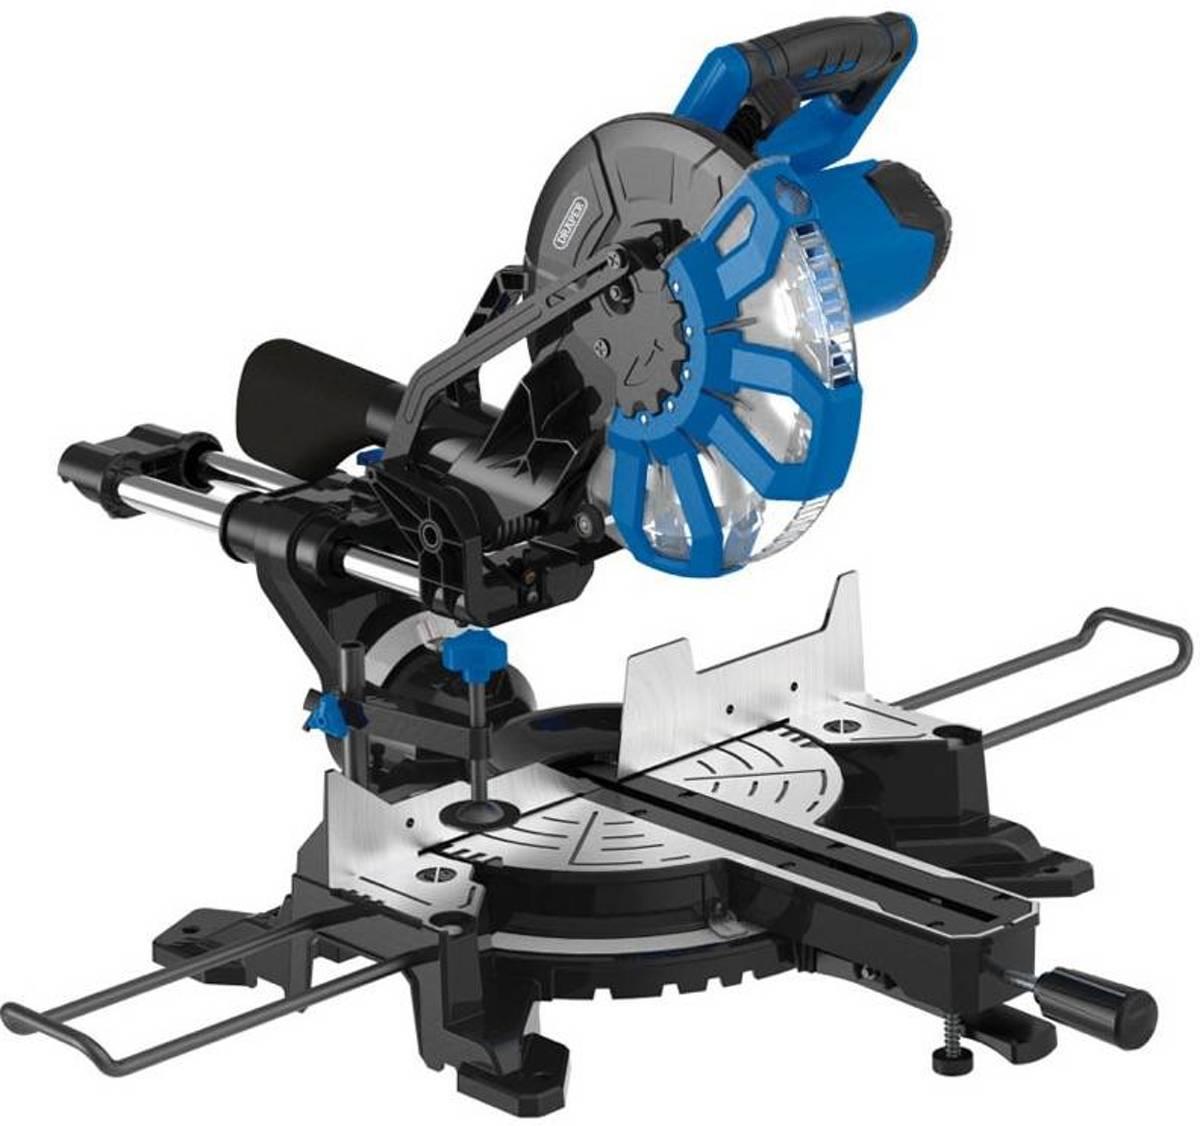 Draper 250mm 2000W 230V Glijdende Compound Mitre Saw met Laser Cutting Guide